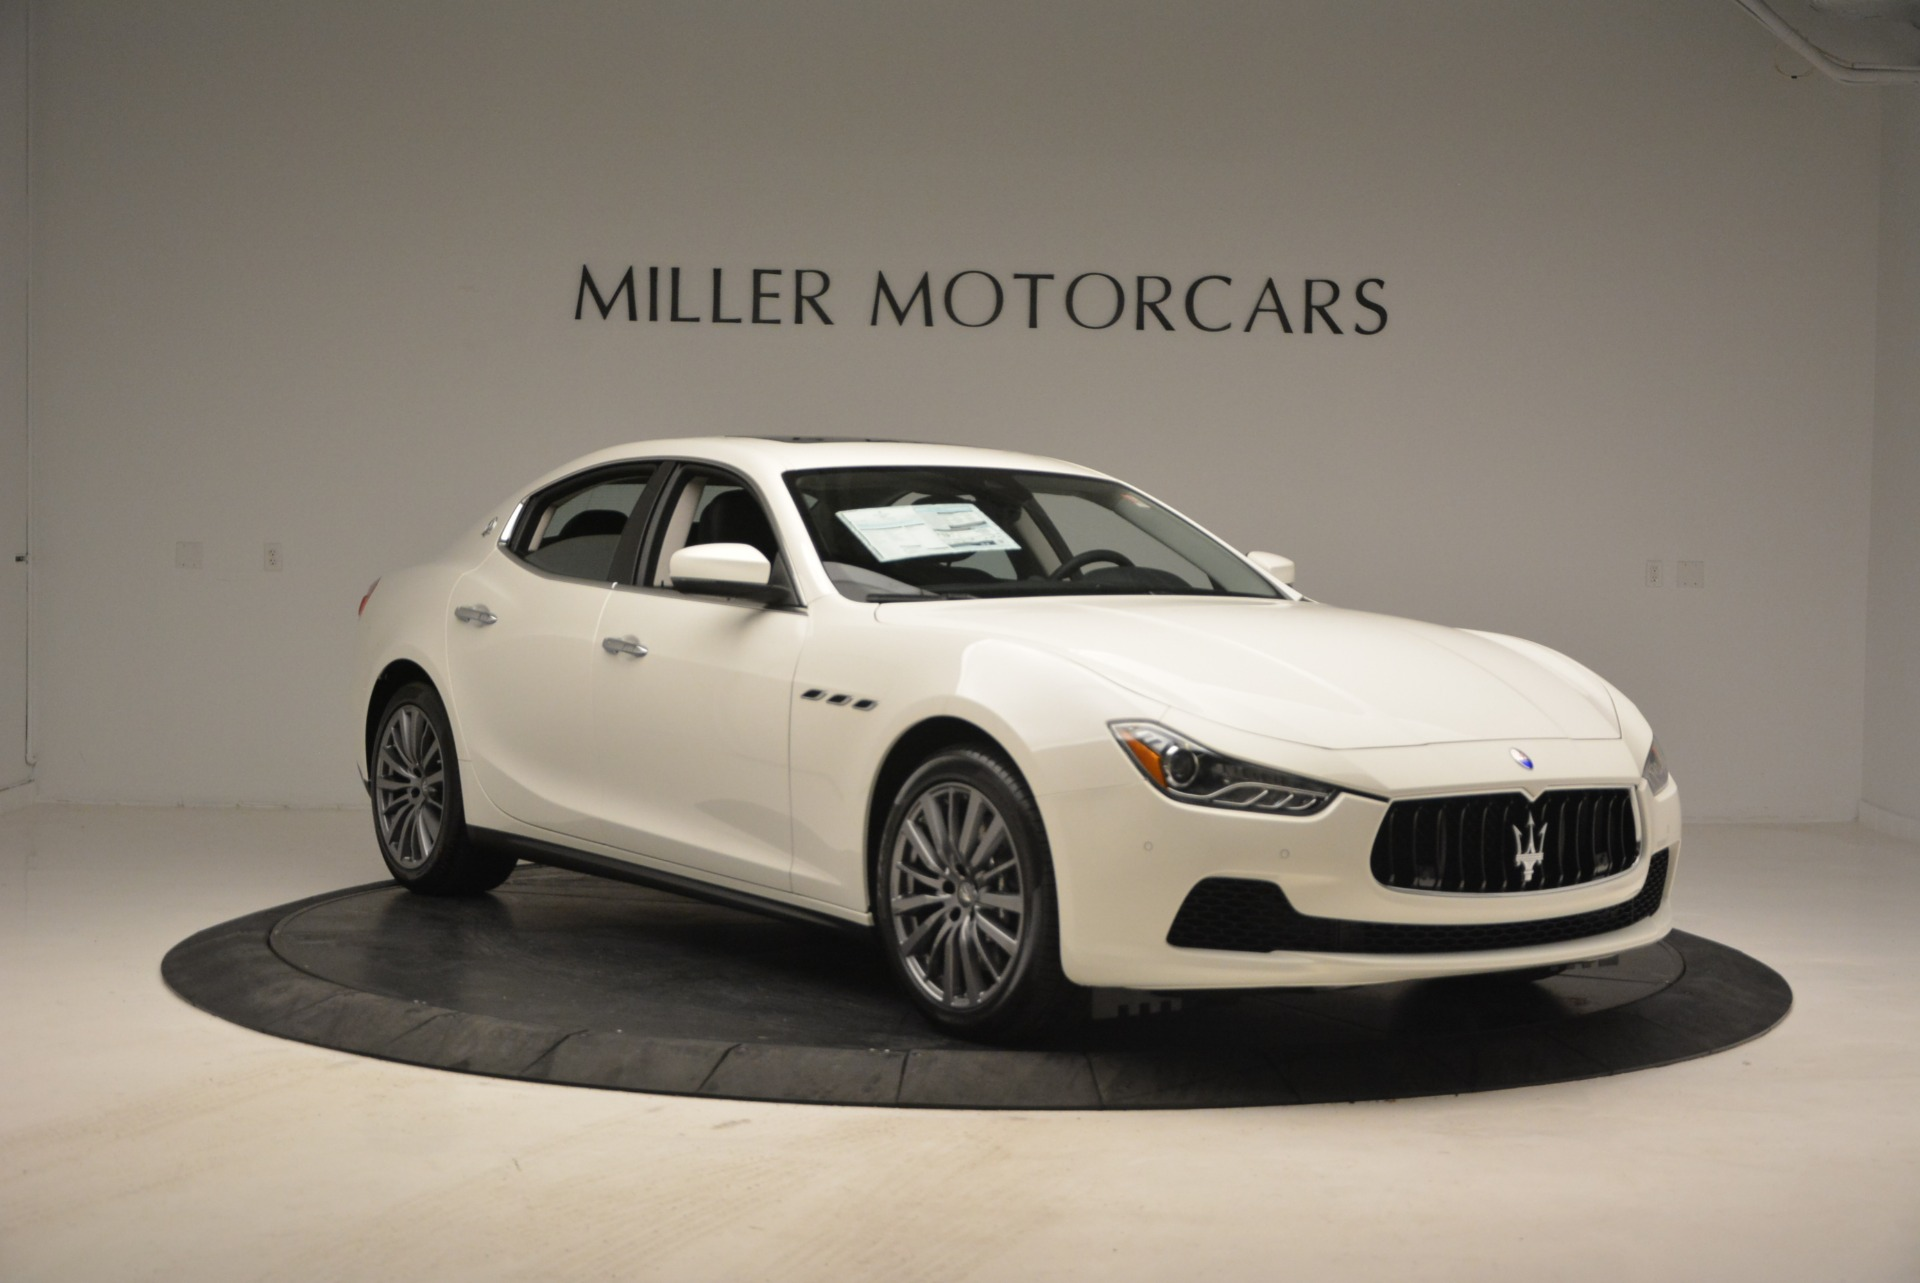 New 2017 Maserati Ghibli S Q4 EX-Loaner For Sale In Greenwich, CT 1031_p11